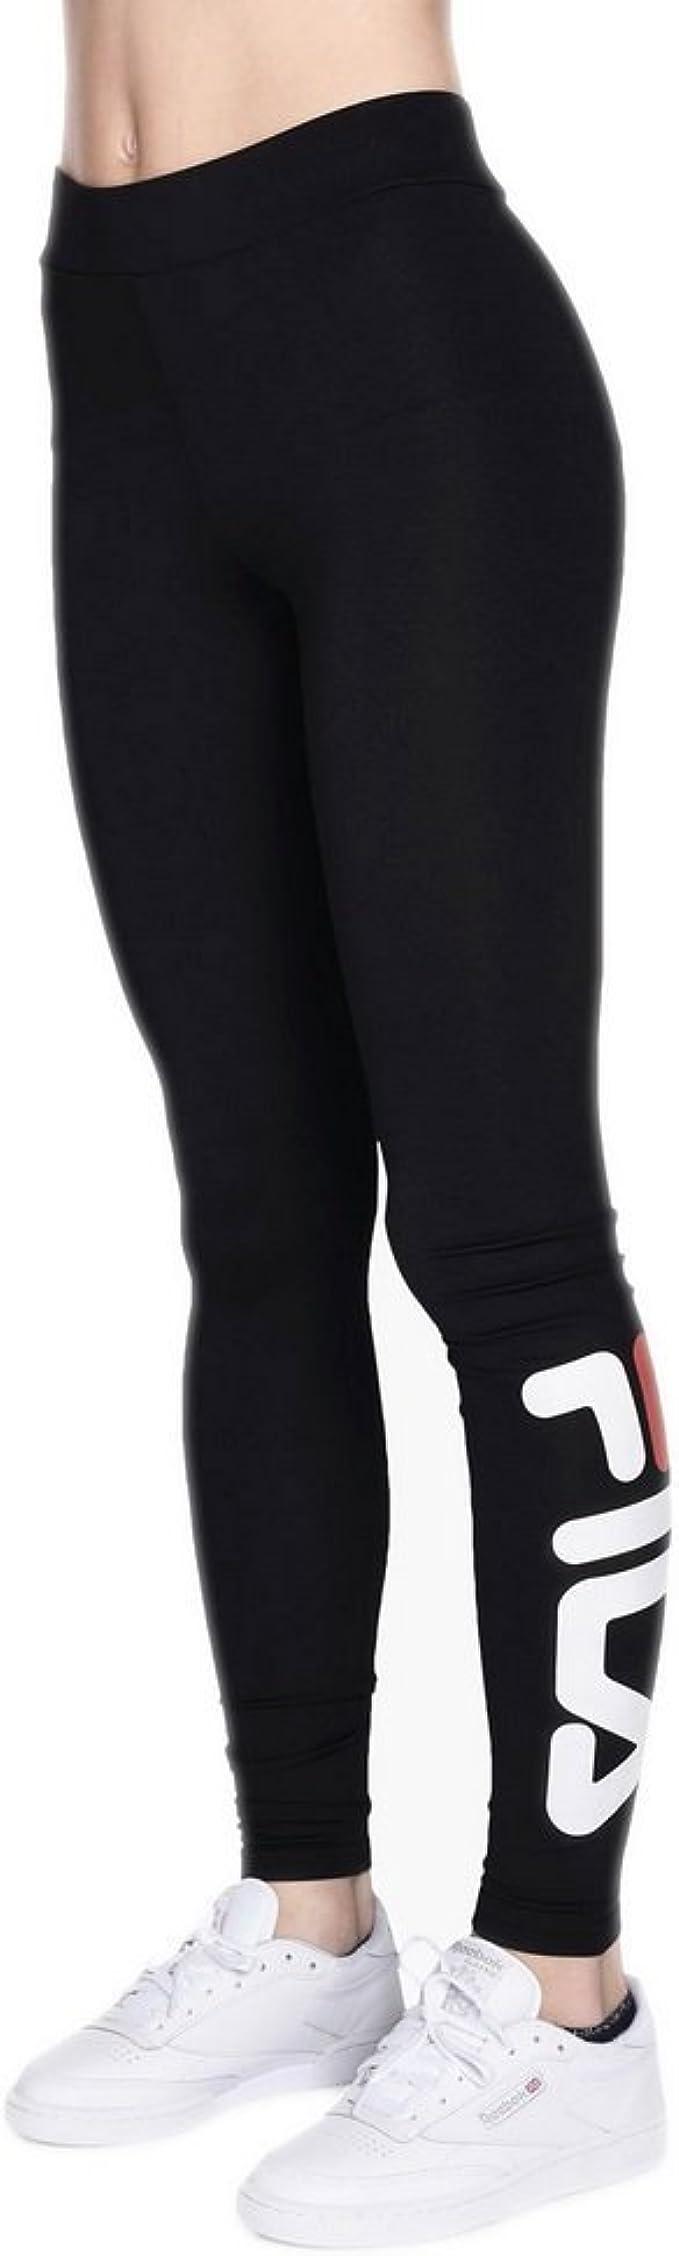 Fila Flex 2.0 Leggings Femme Noir XS (X Small):